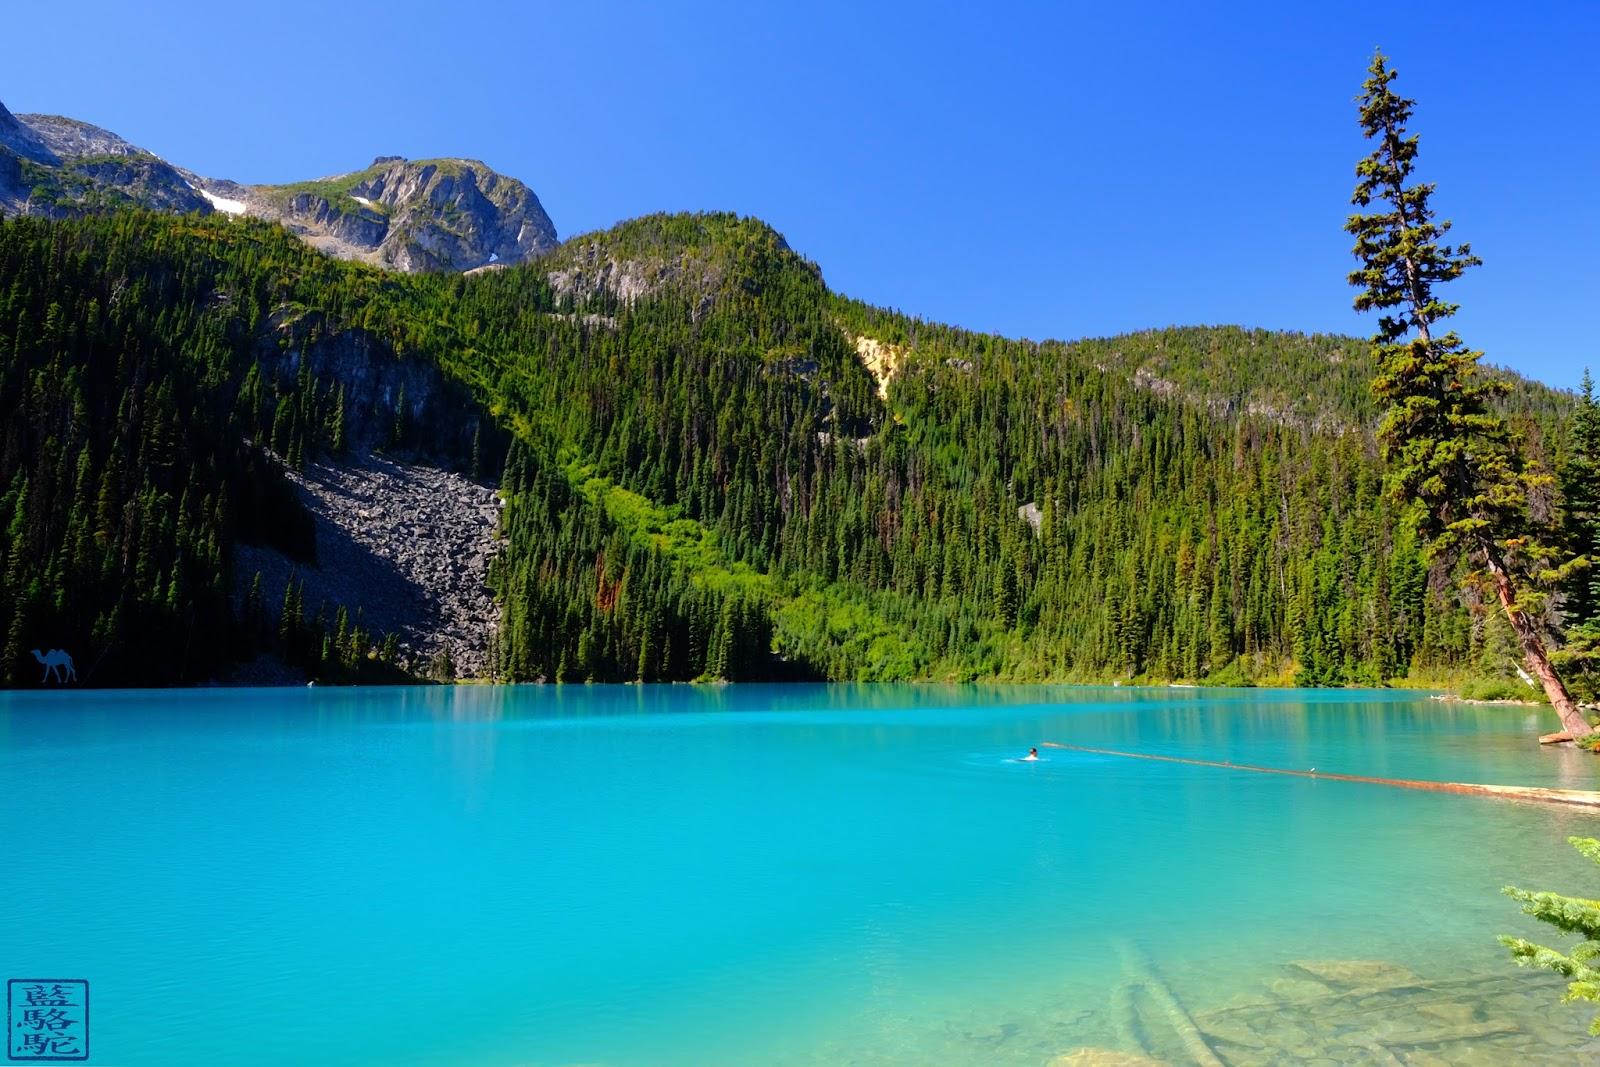 Le Chameau Bleu - Joffre Lake